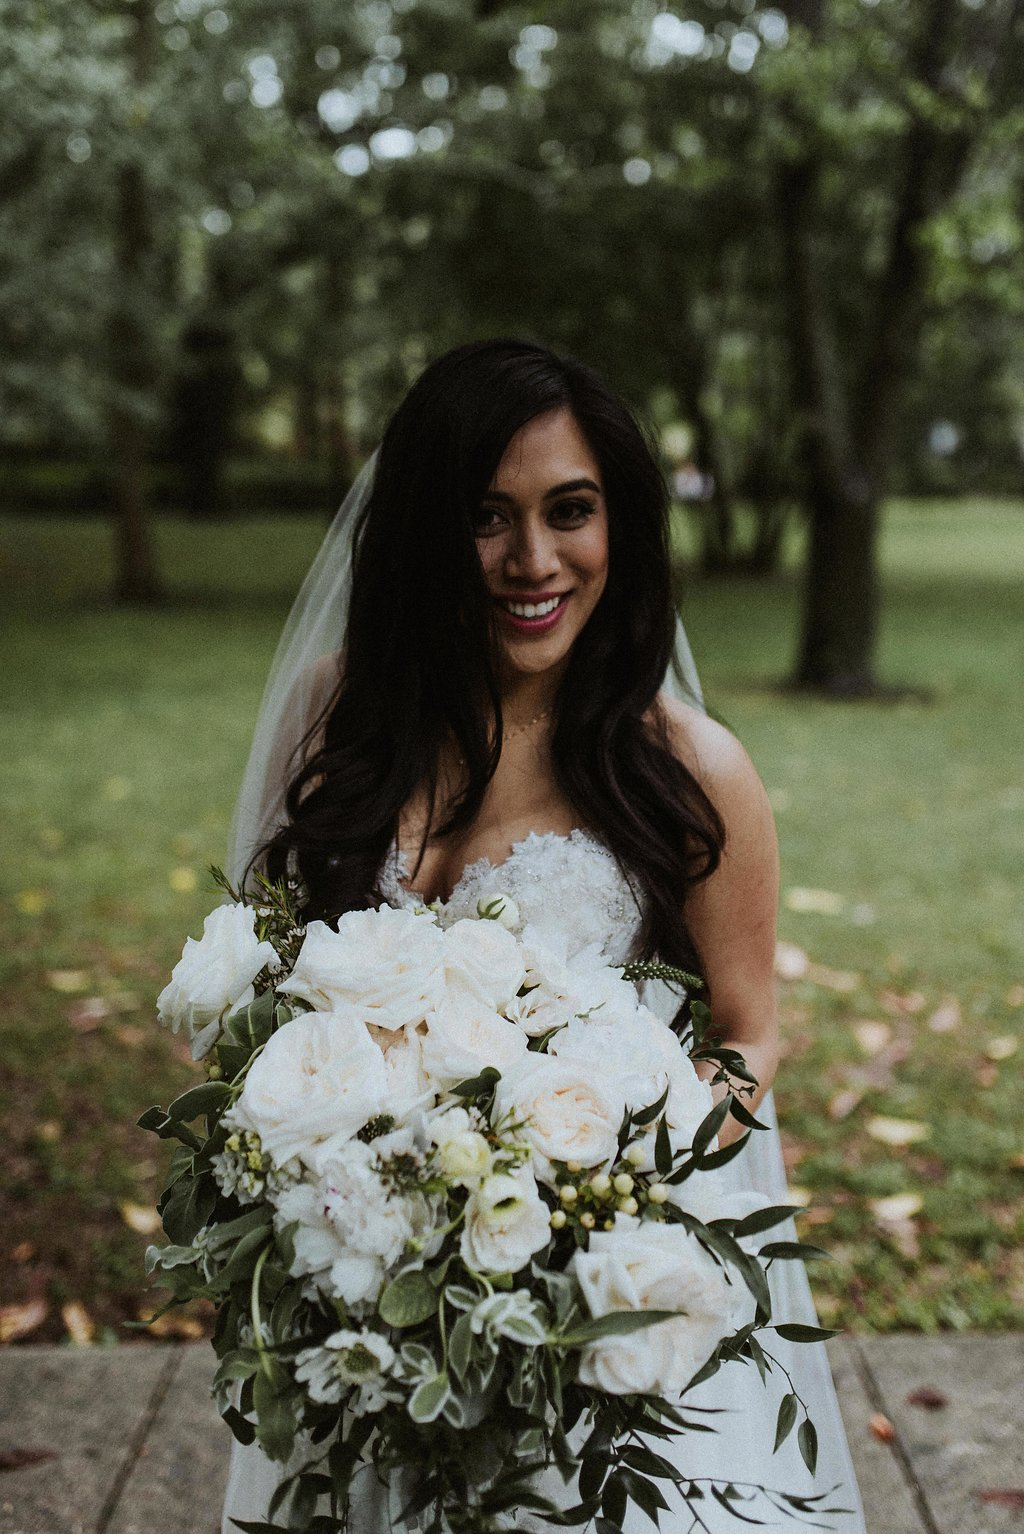 ivory-and-beau-bridal-boutique-alex-and-josephine-meghan-melia-photography-brockington-hall-wedding-savannah-wedding-22.jpg